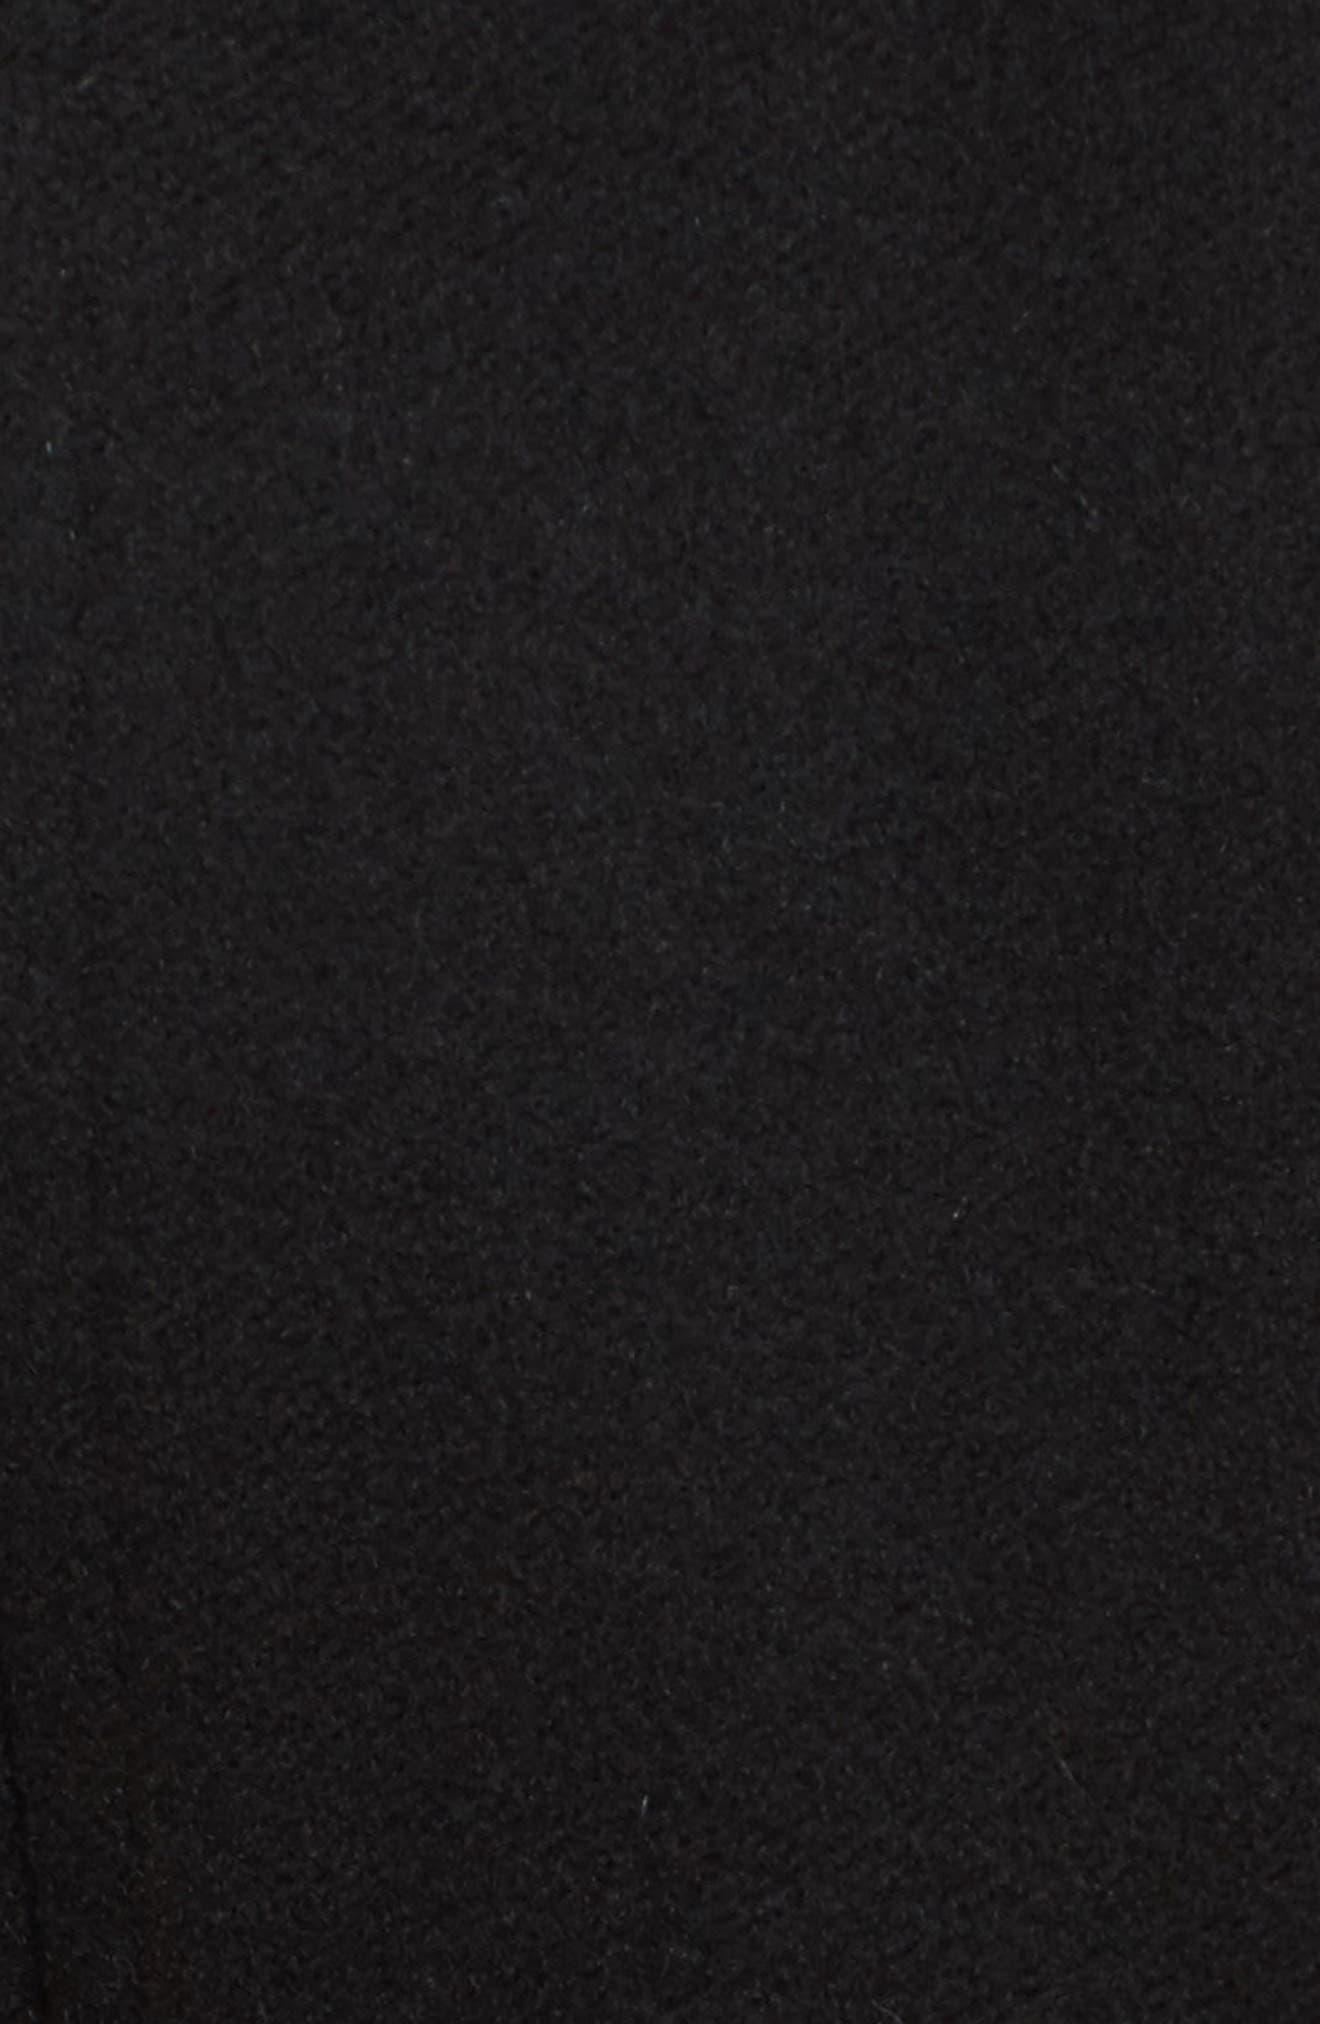 Wool & Cashmere Blend Military Coat,                             Alternate thumbnail 6, color,                             001